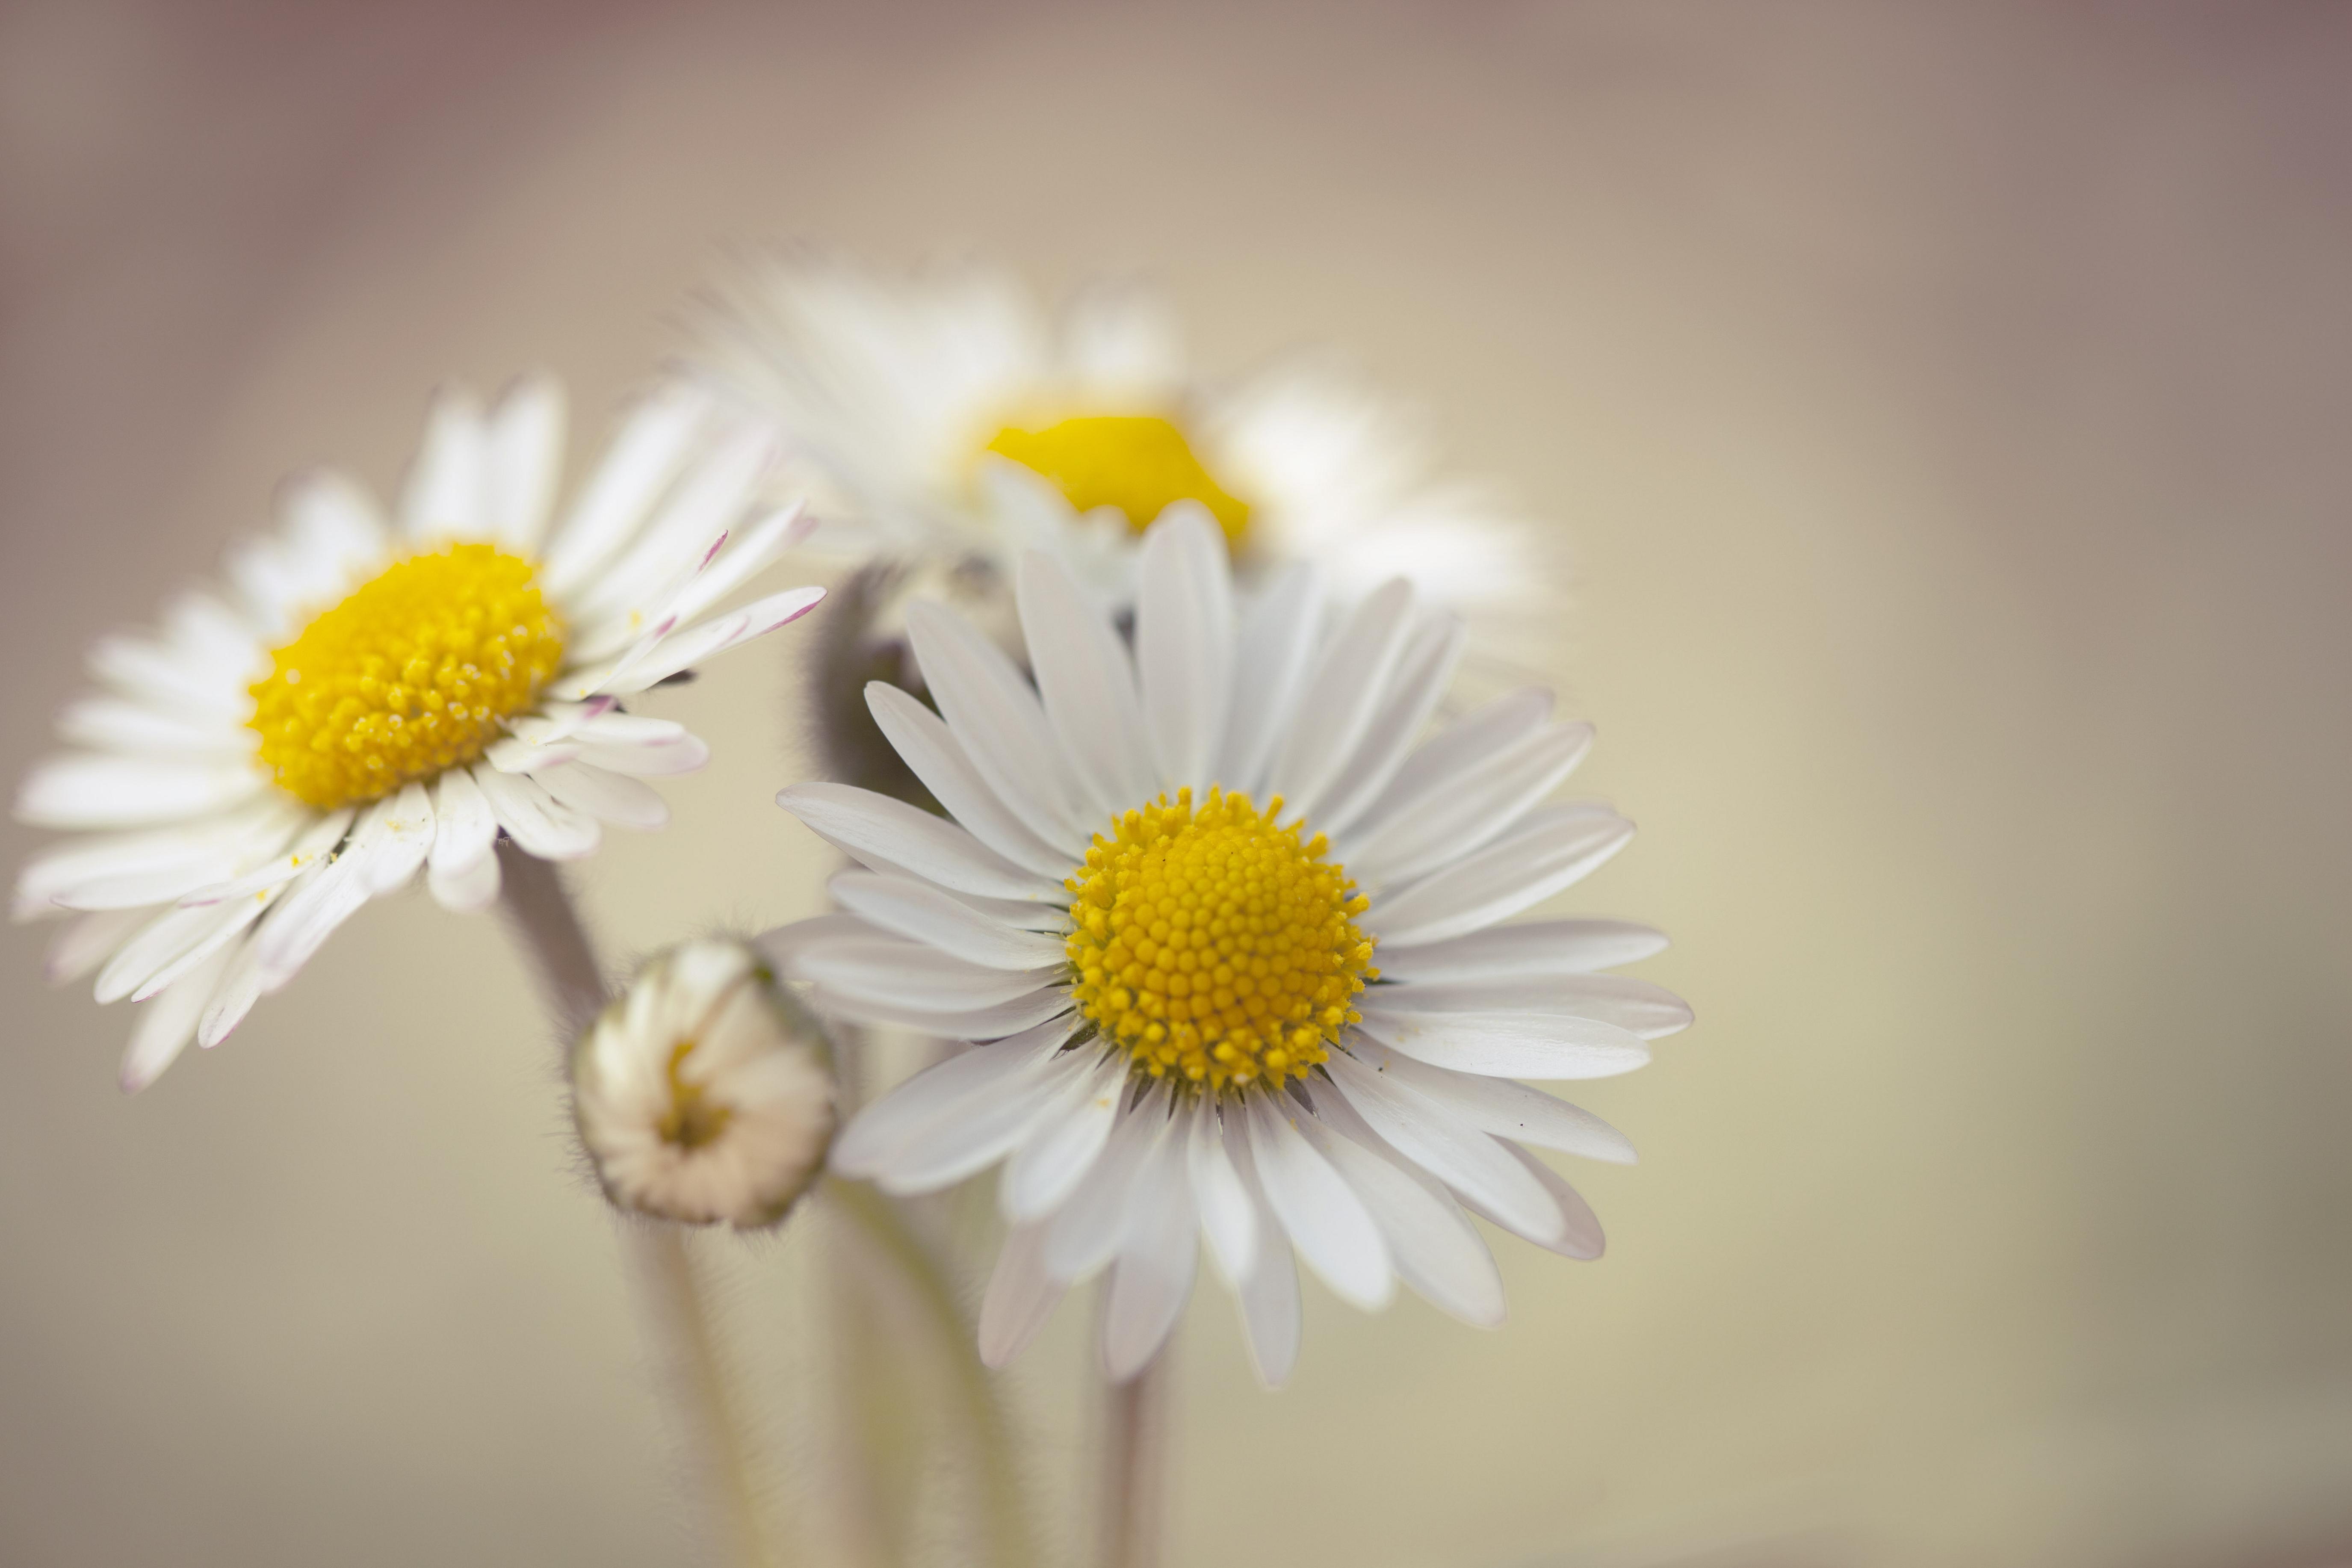 oxeye daisy - Wiktionary